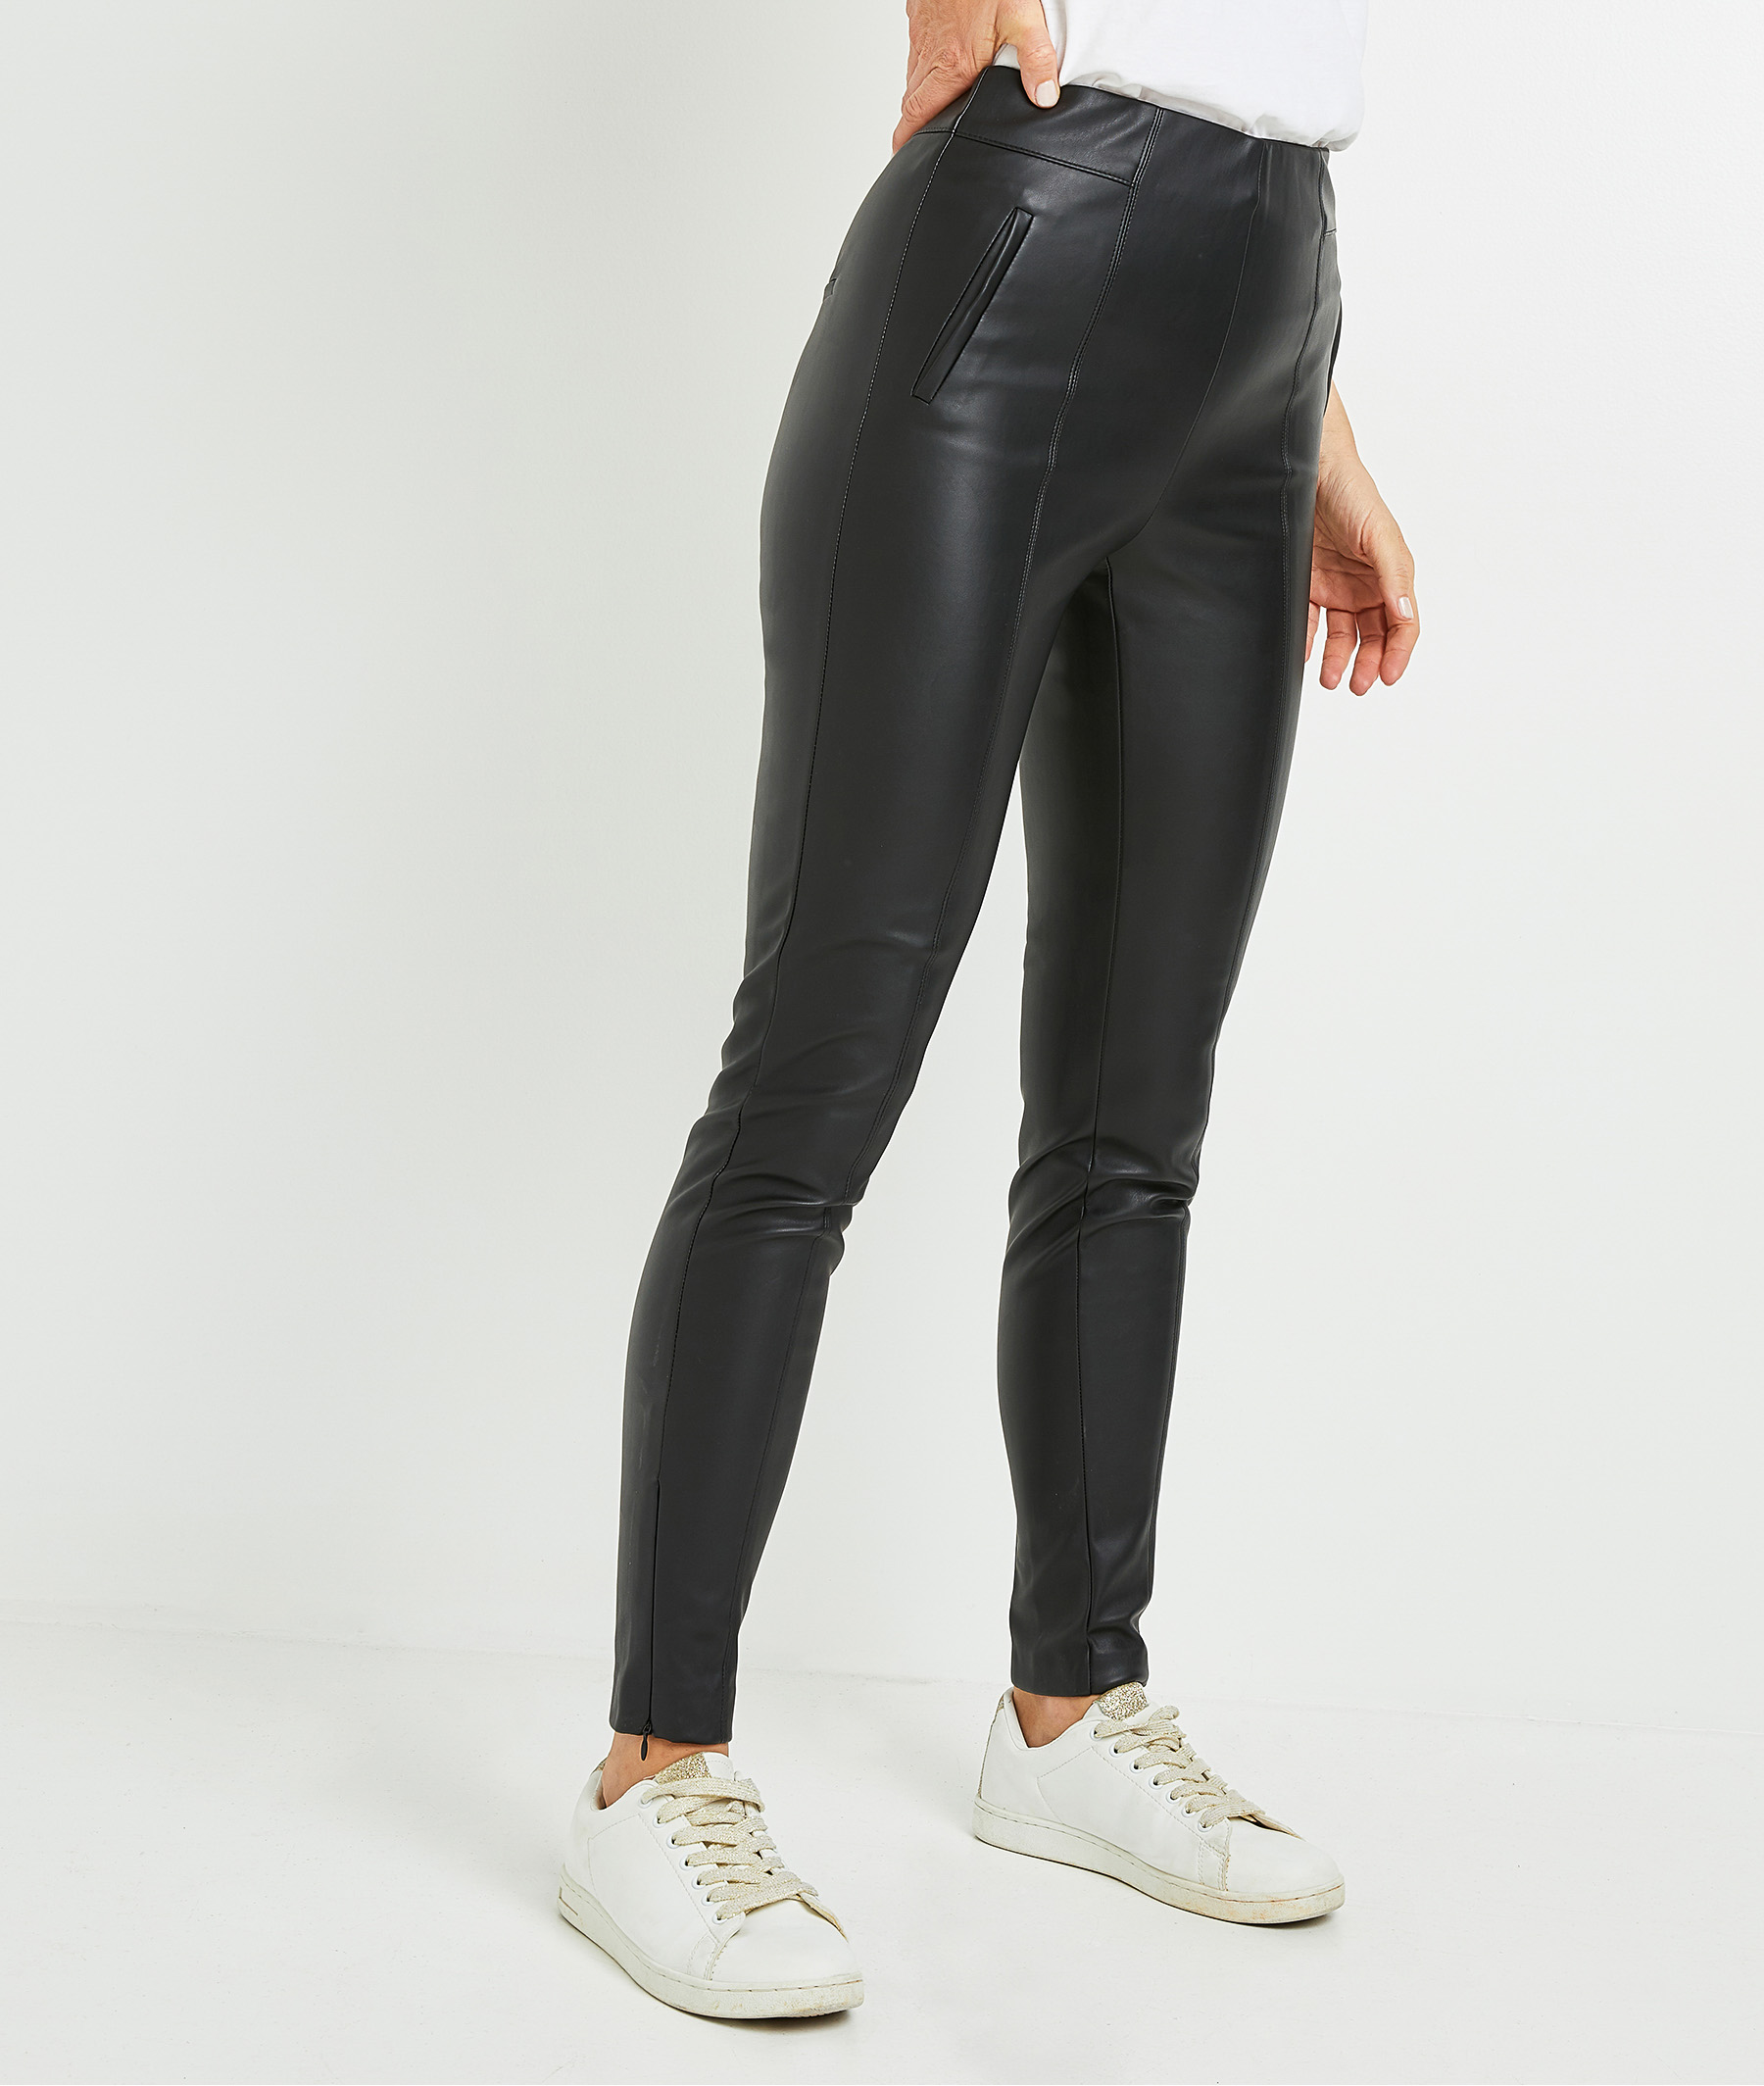 Legging en simili cuir noir femme NOIR